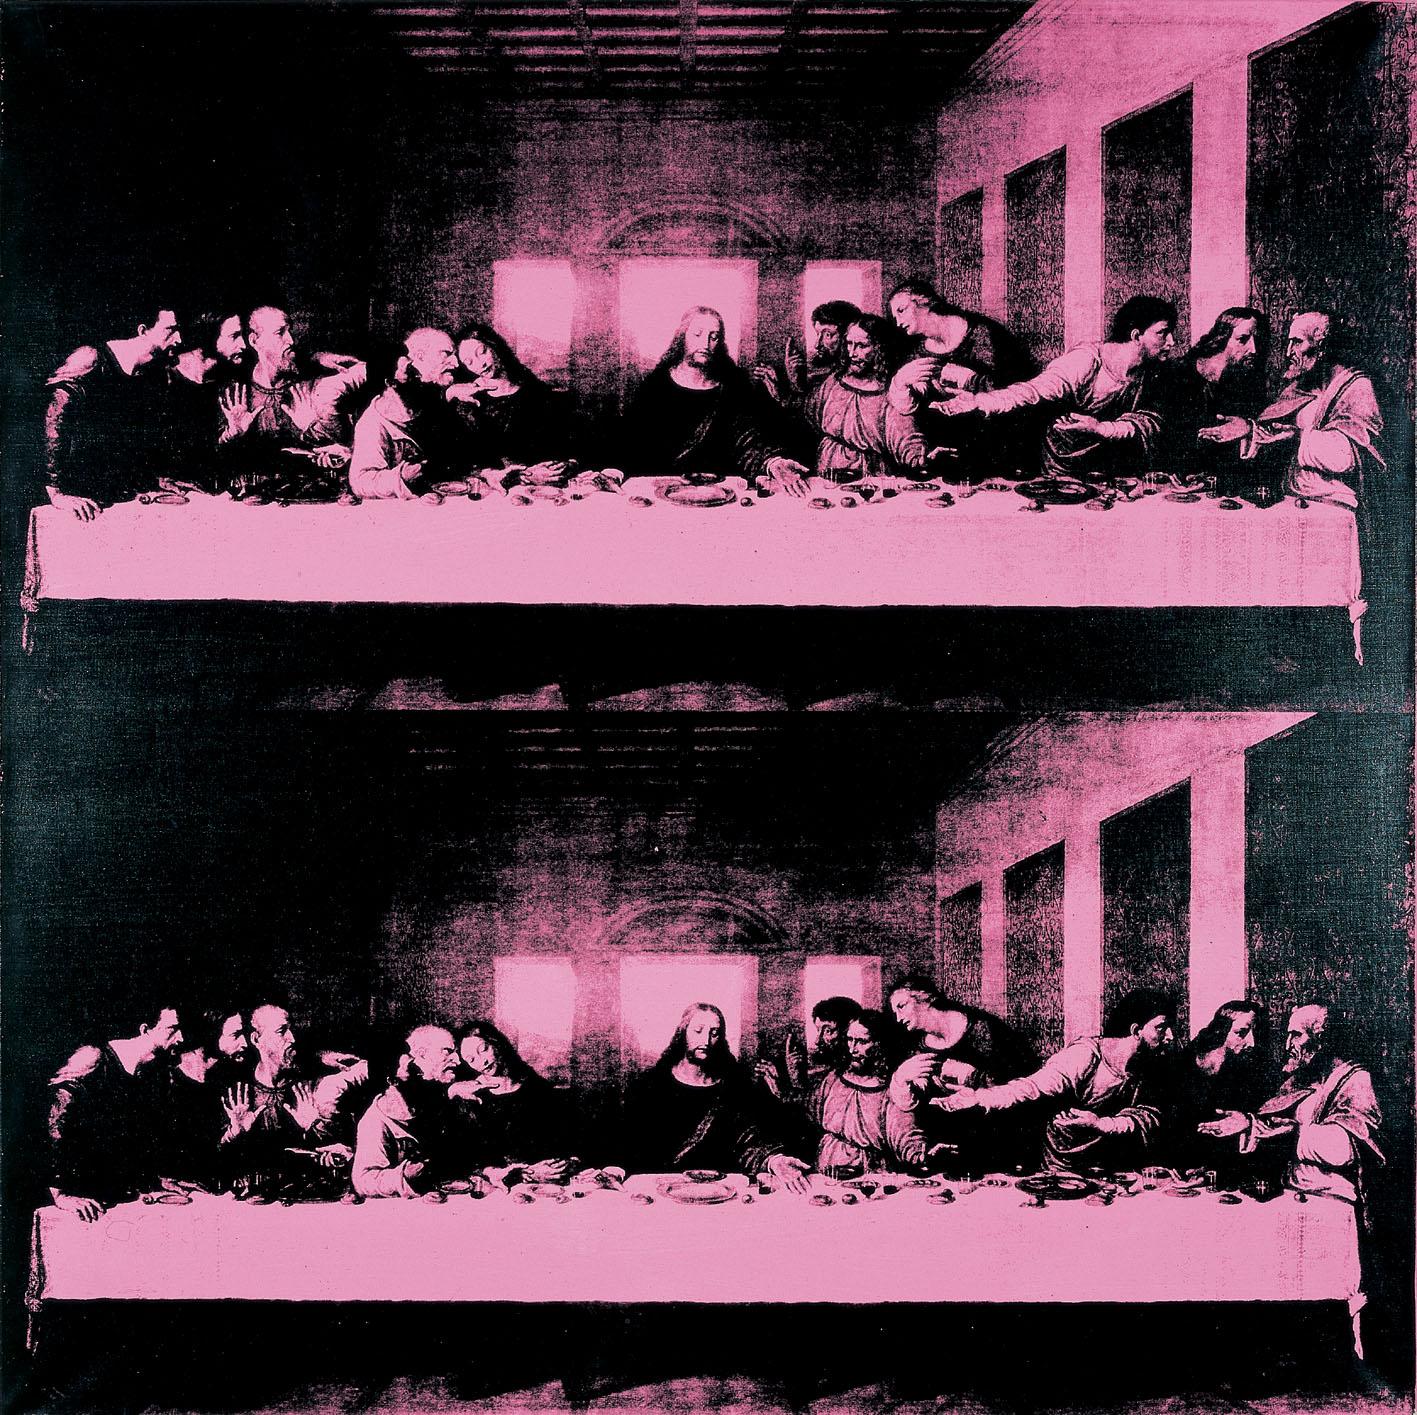 Andy Warhol, The Last Supper, 1987, Collezione Creval.